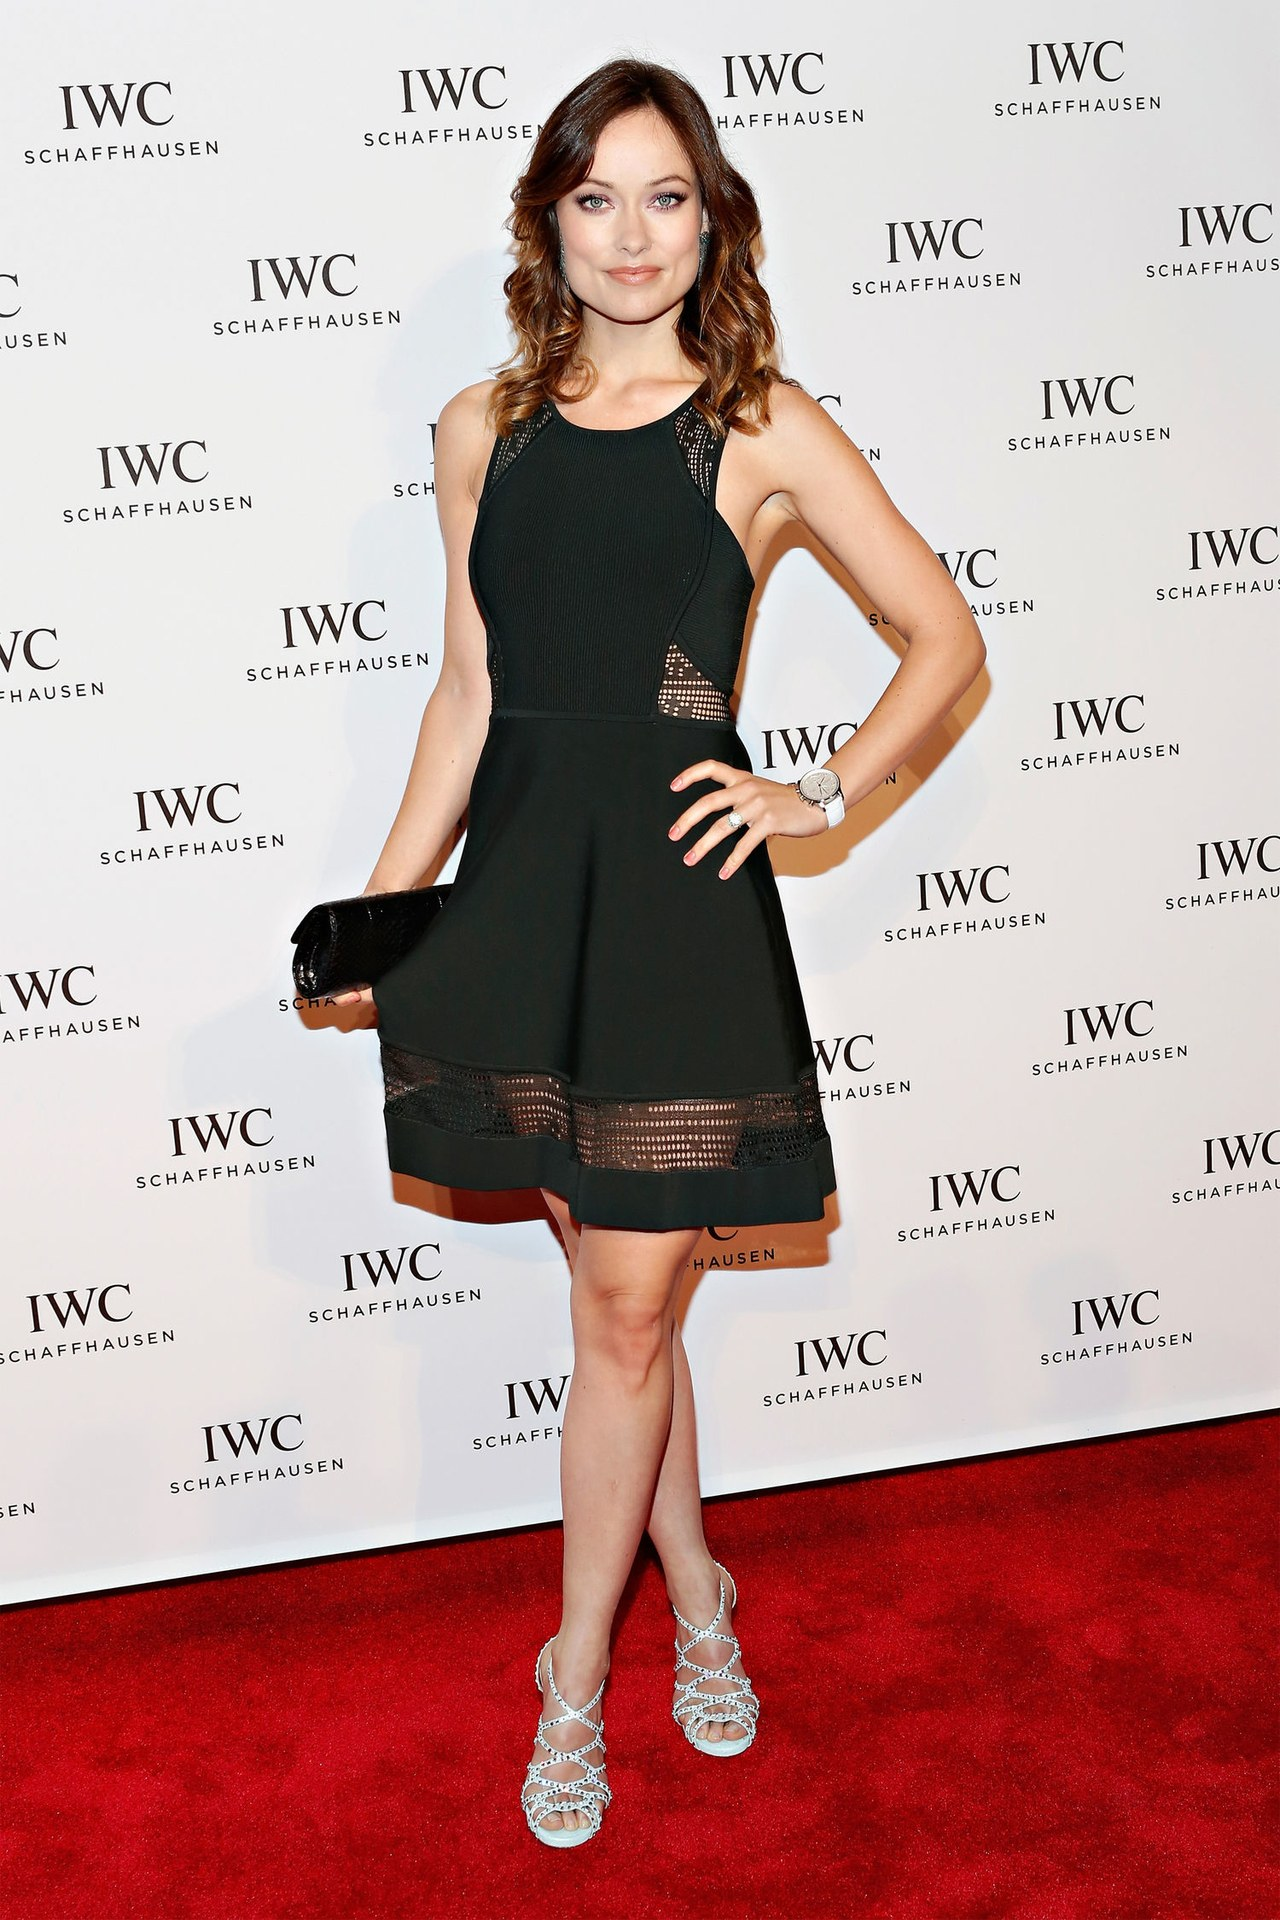 Olivia-Wilde-Age-Height-Weight US Actress Olivia Wilde Wiki Bio Age Top Weight Scorching Bikini Photographs